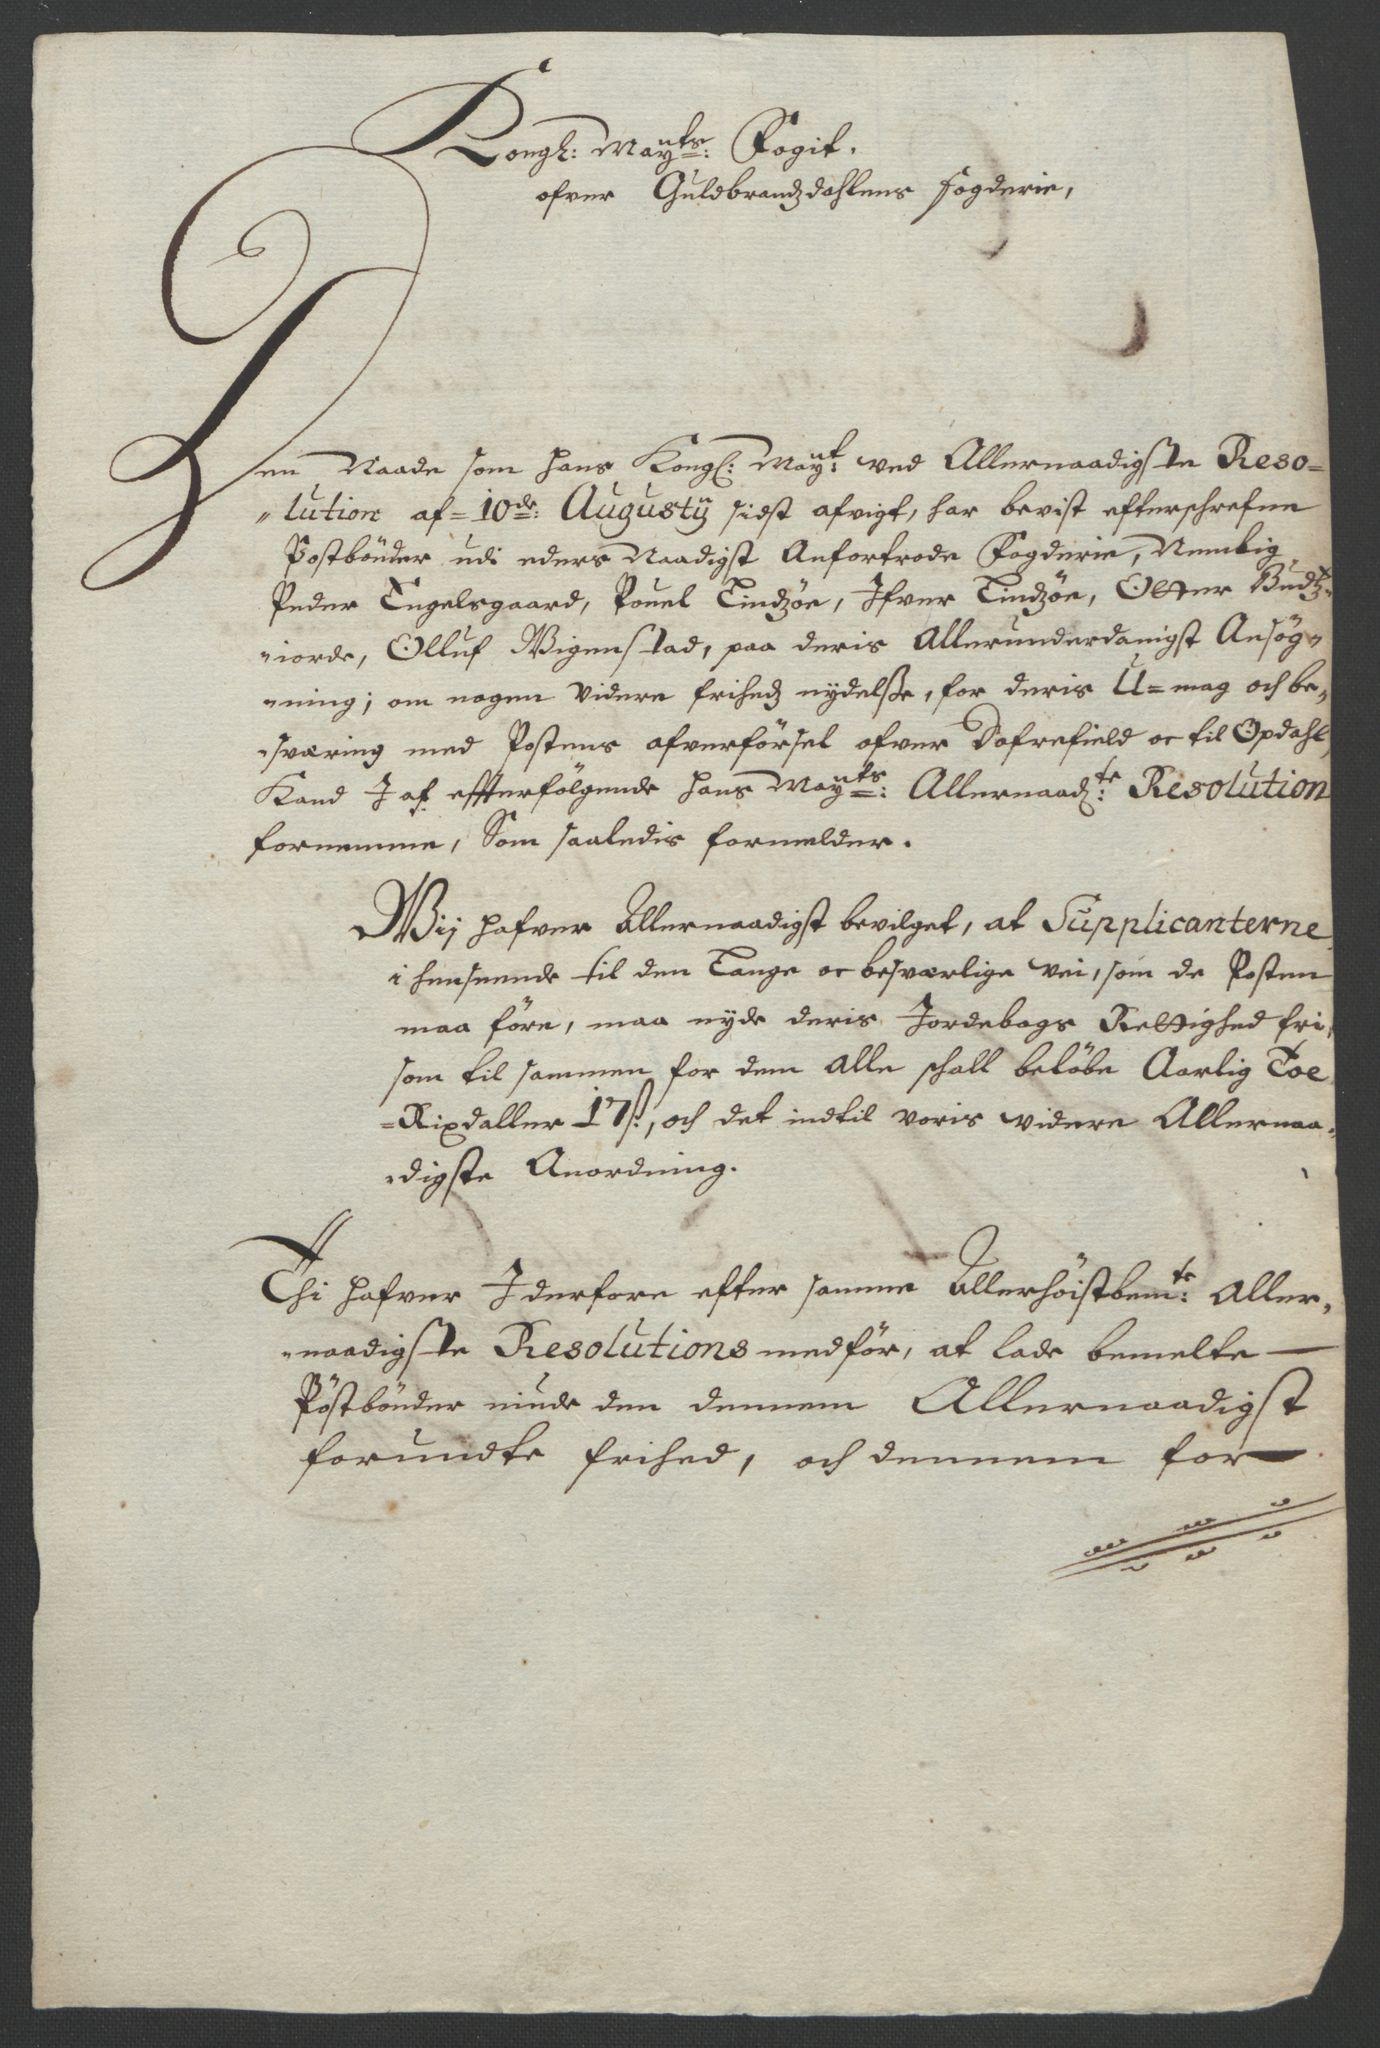 RA, Rentekammeret inntil 1814, Reviderte regnskaper, Fogderegnskap, R17/L1169: Fogderegnskap Gudbrandsdal, 1695, s. 160